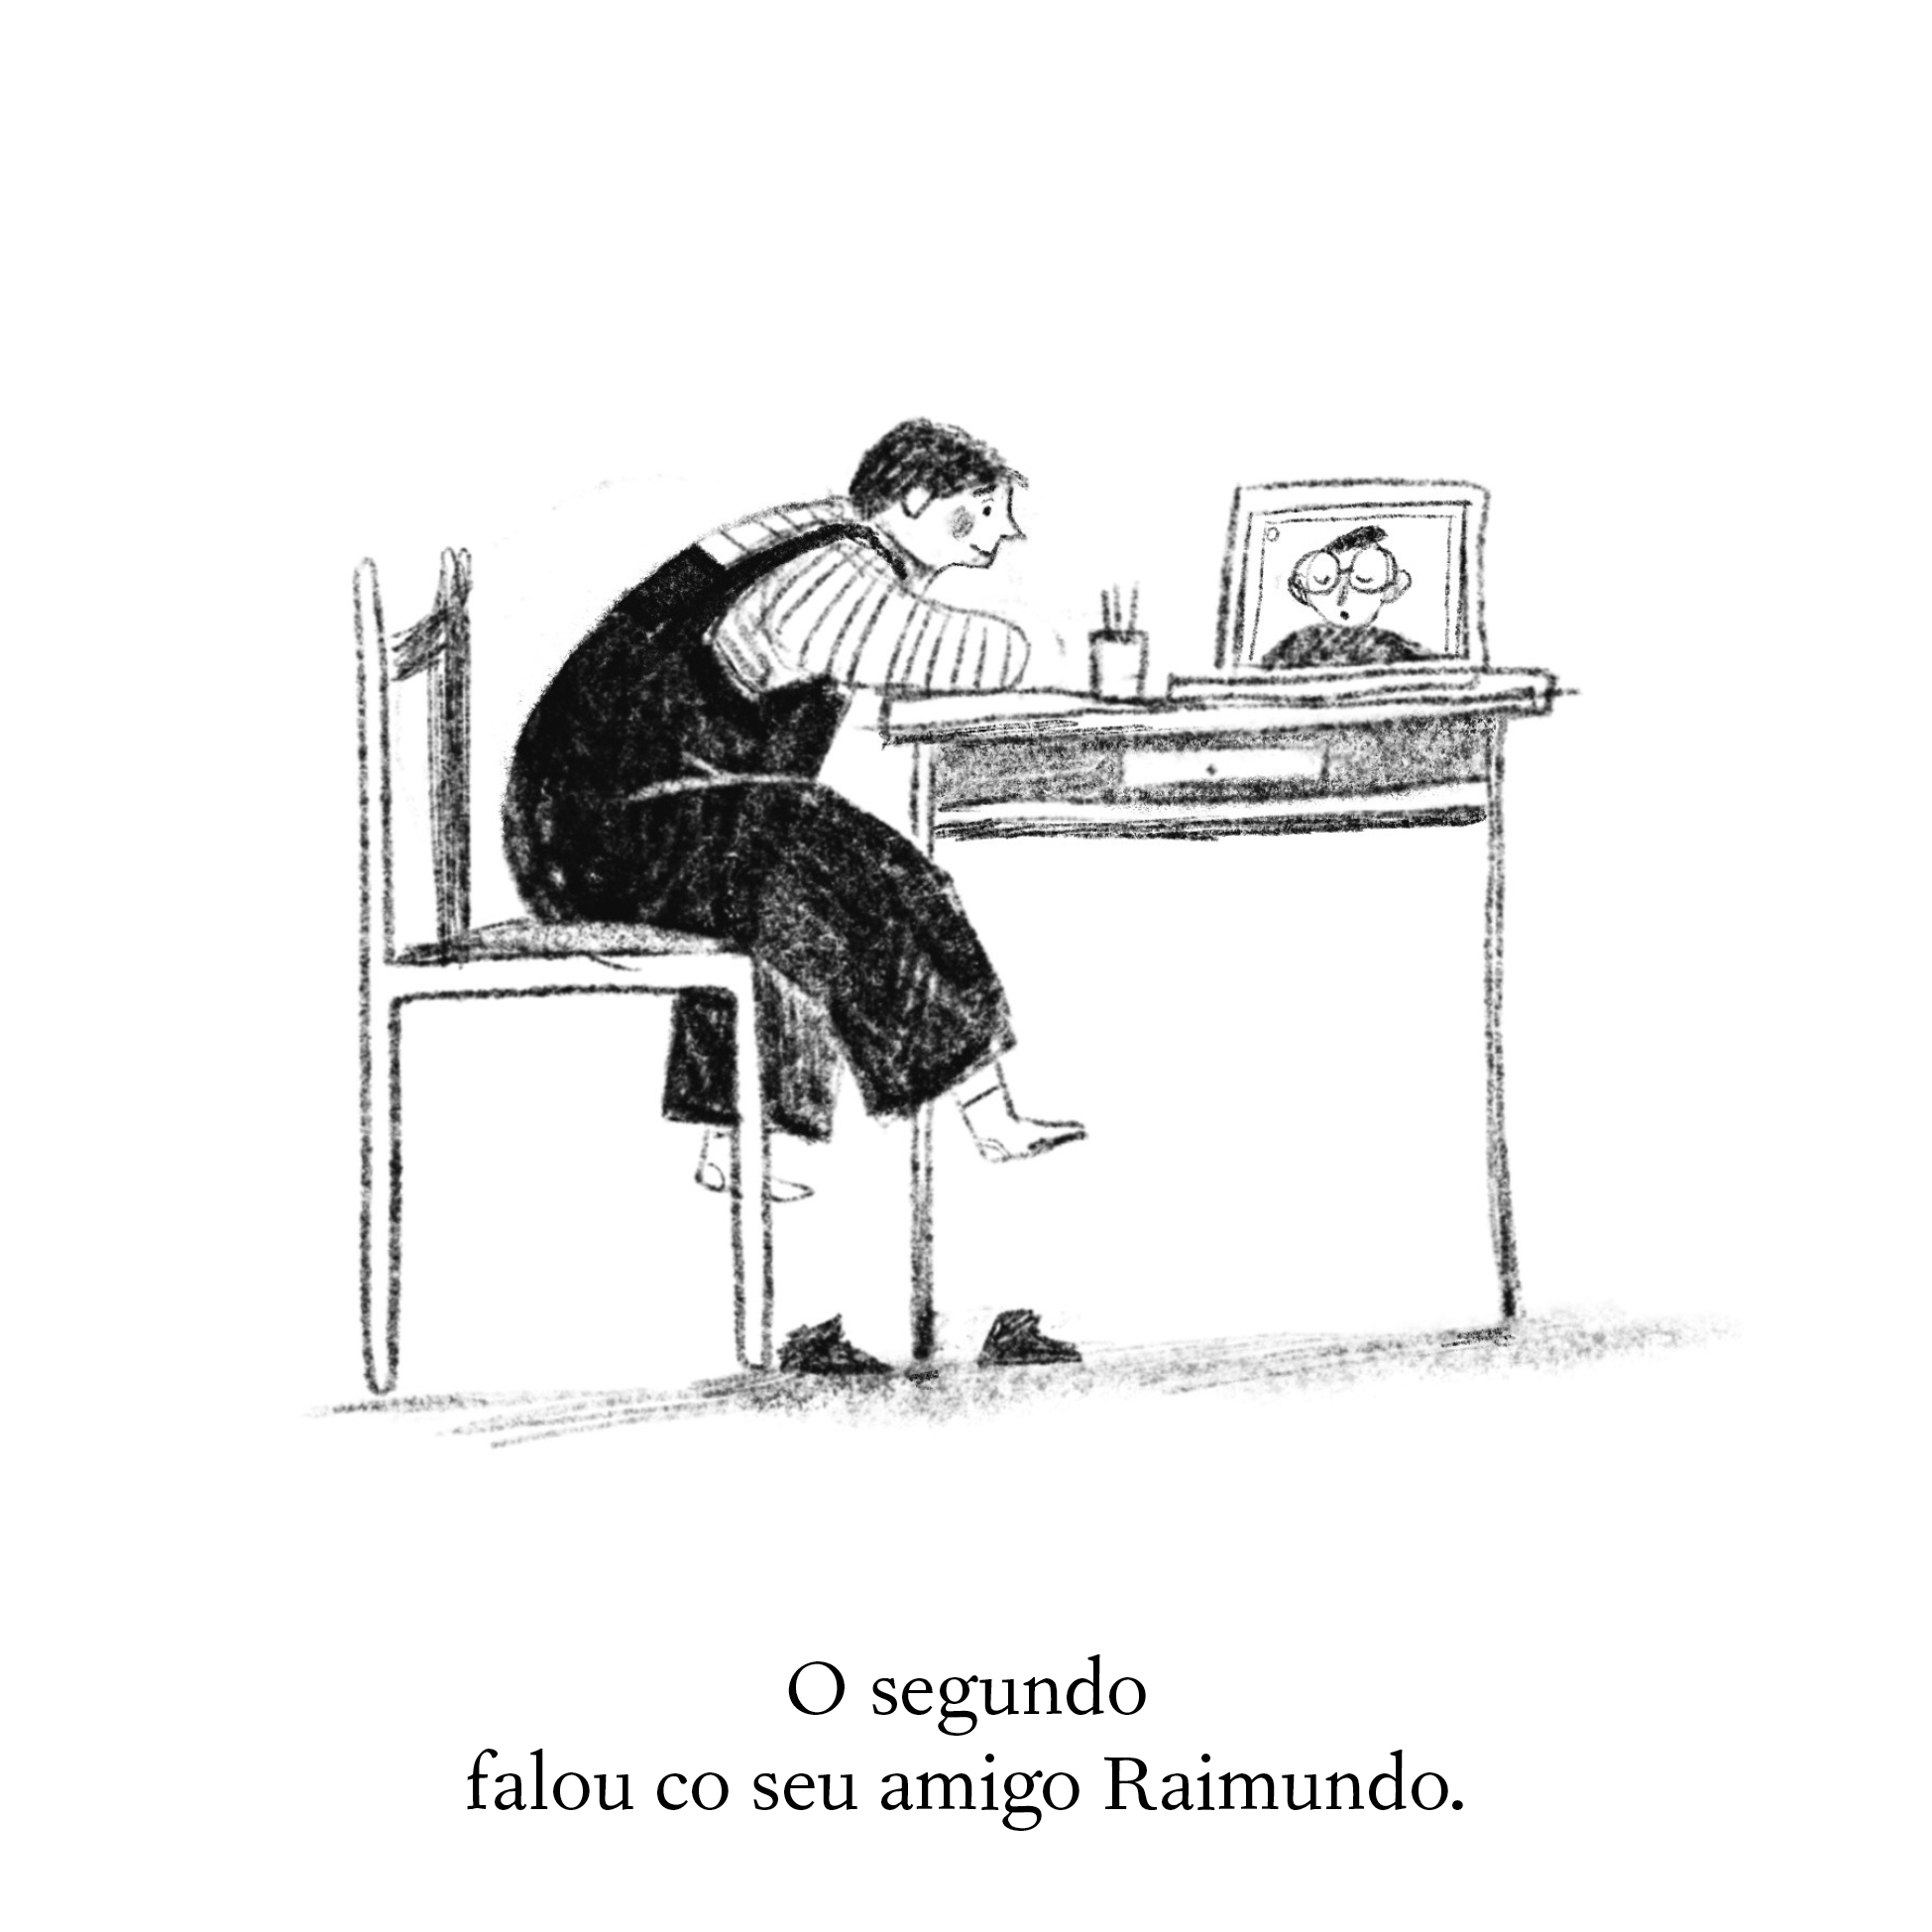 #euquedonacasa - segundo